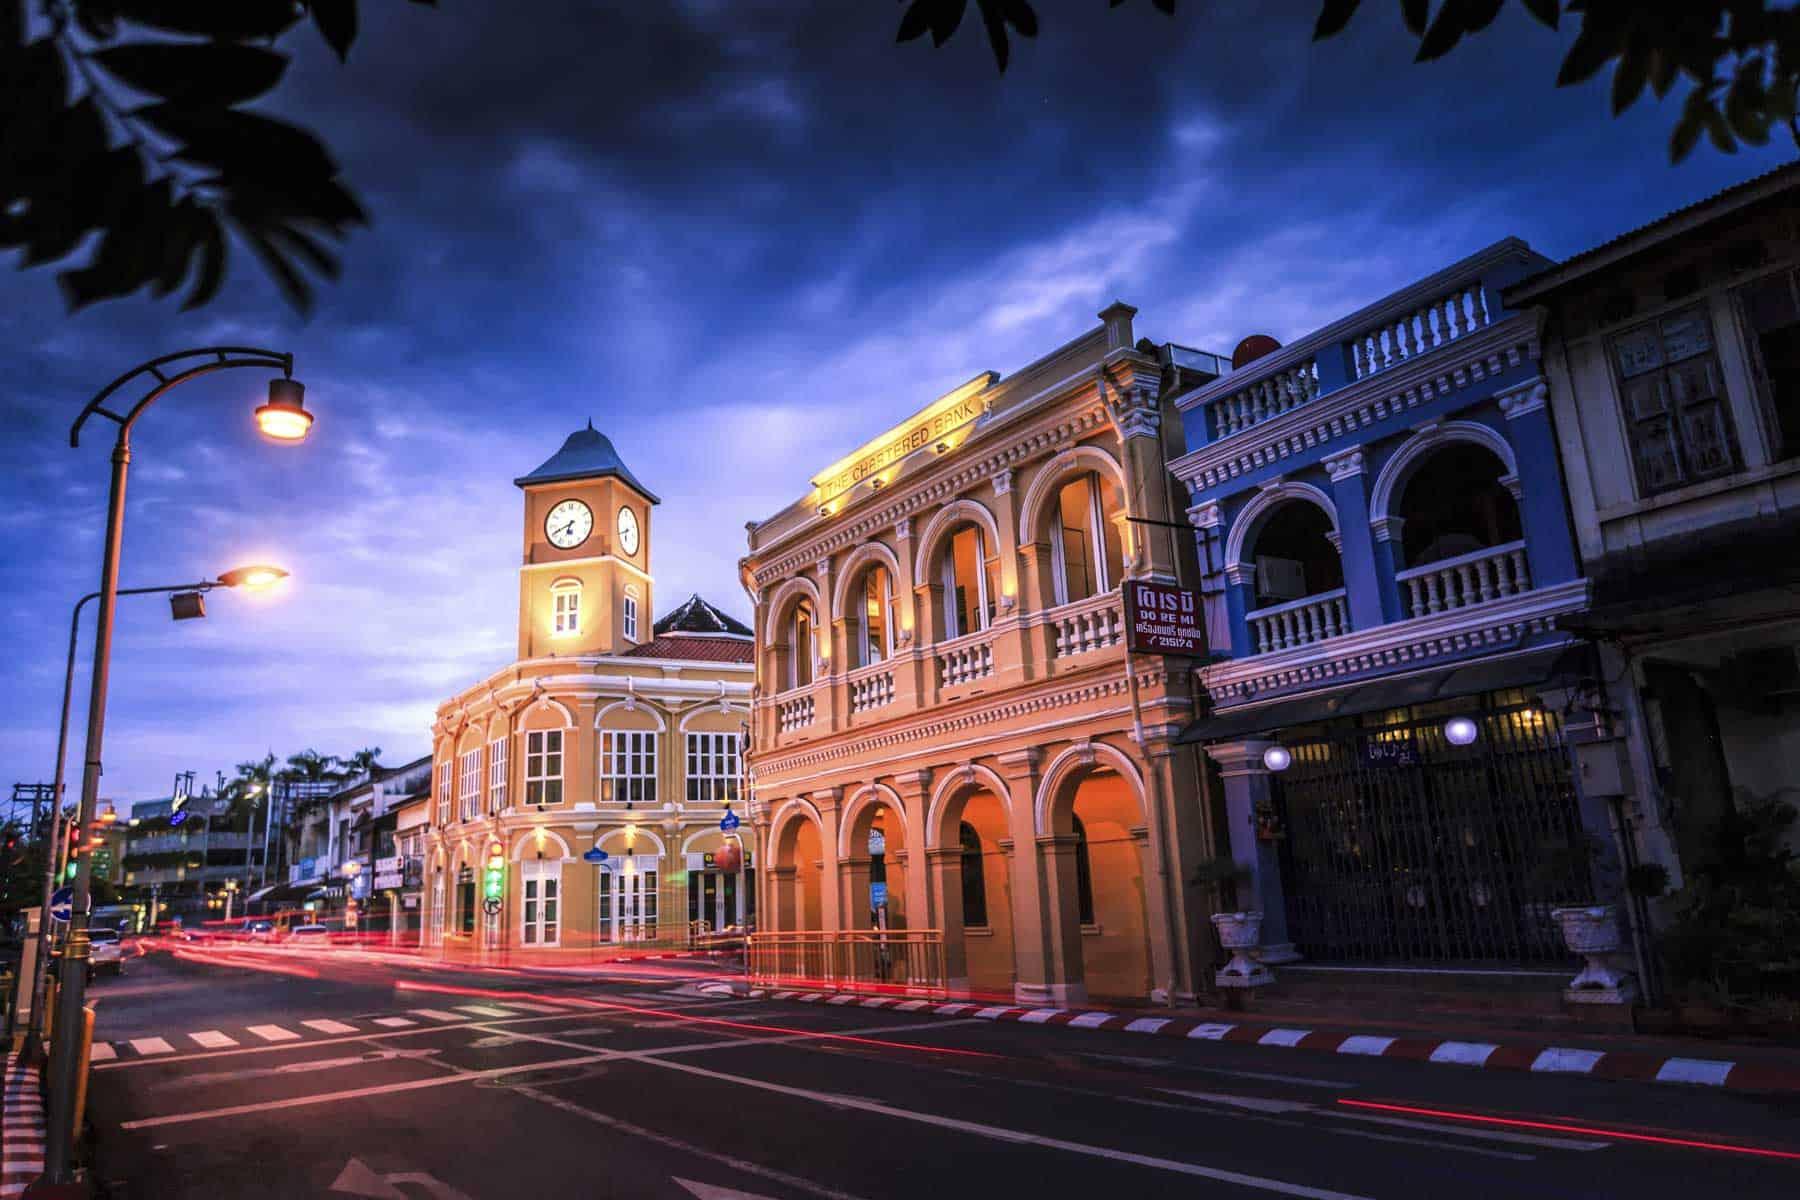 Phuket Tour Company